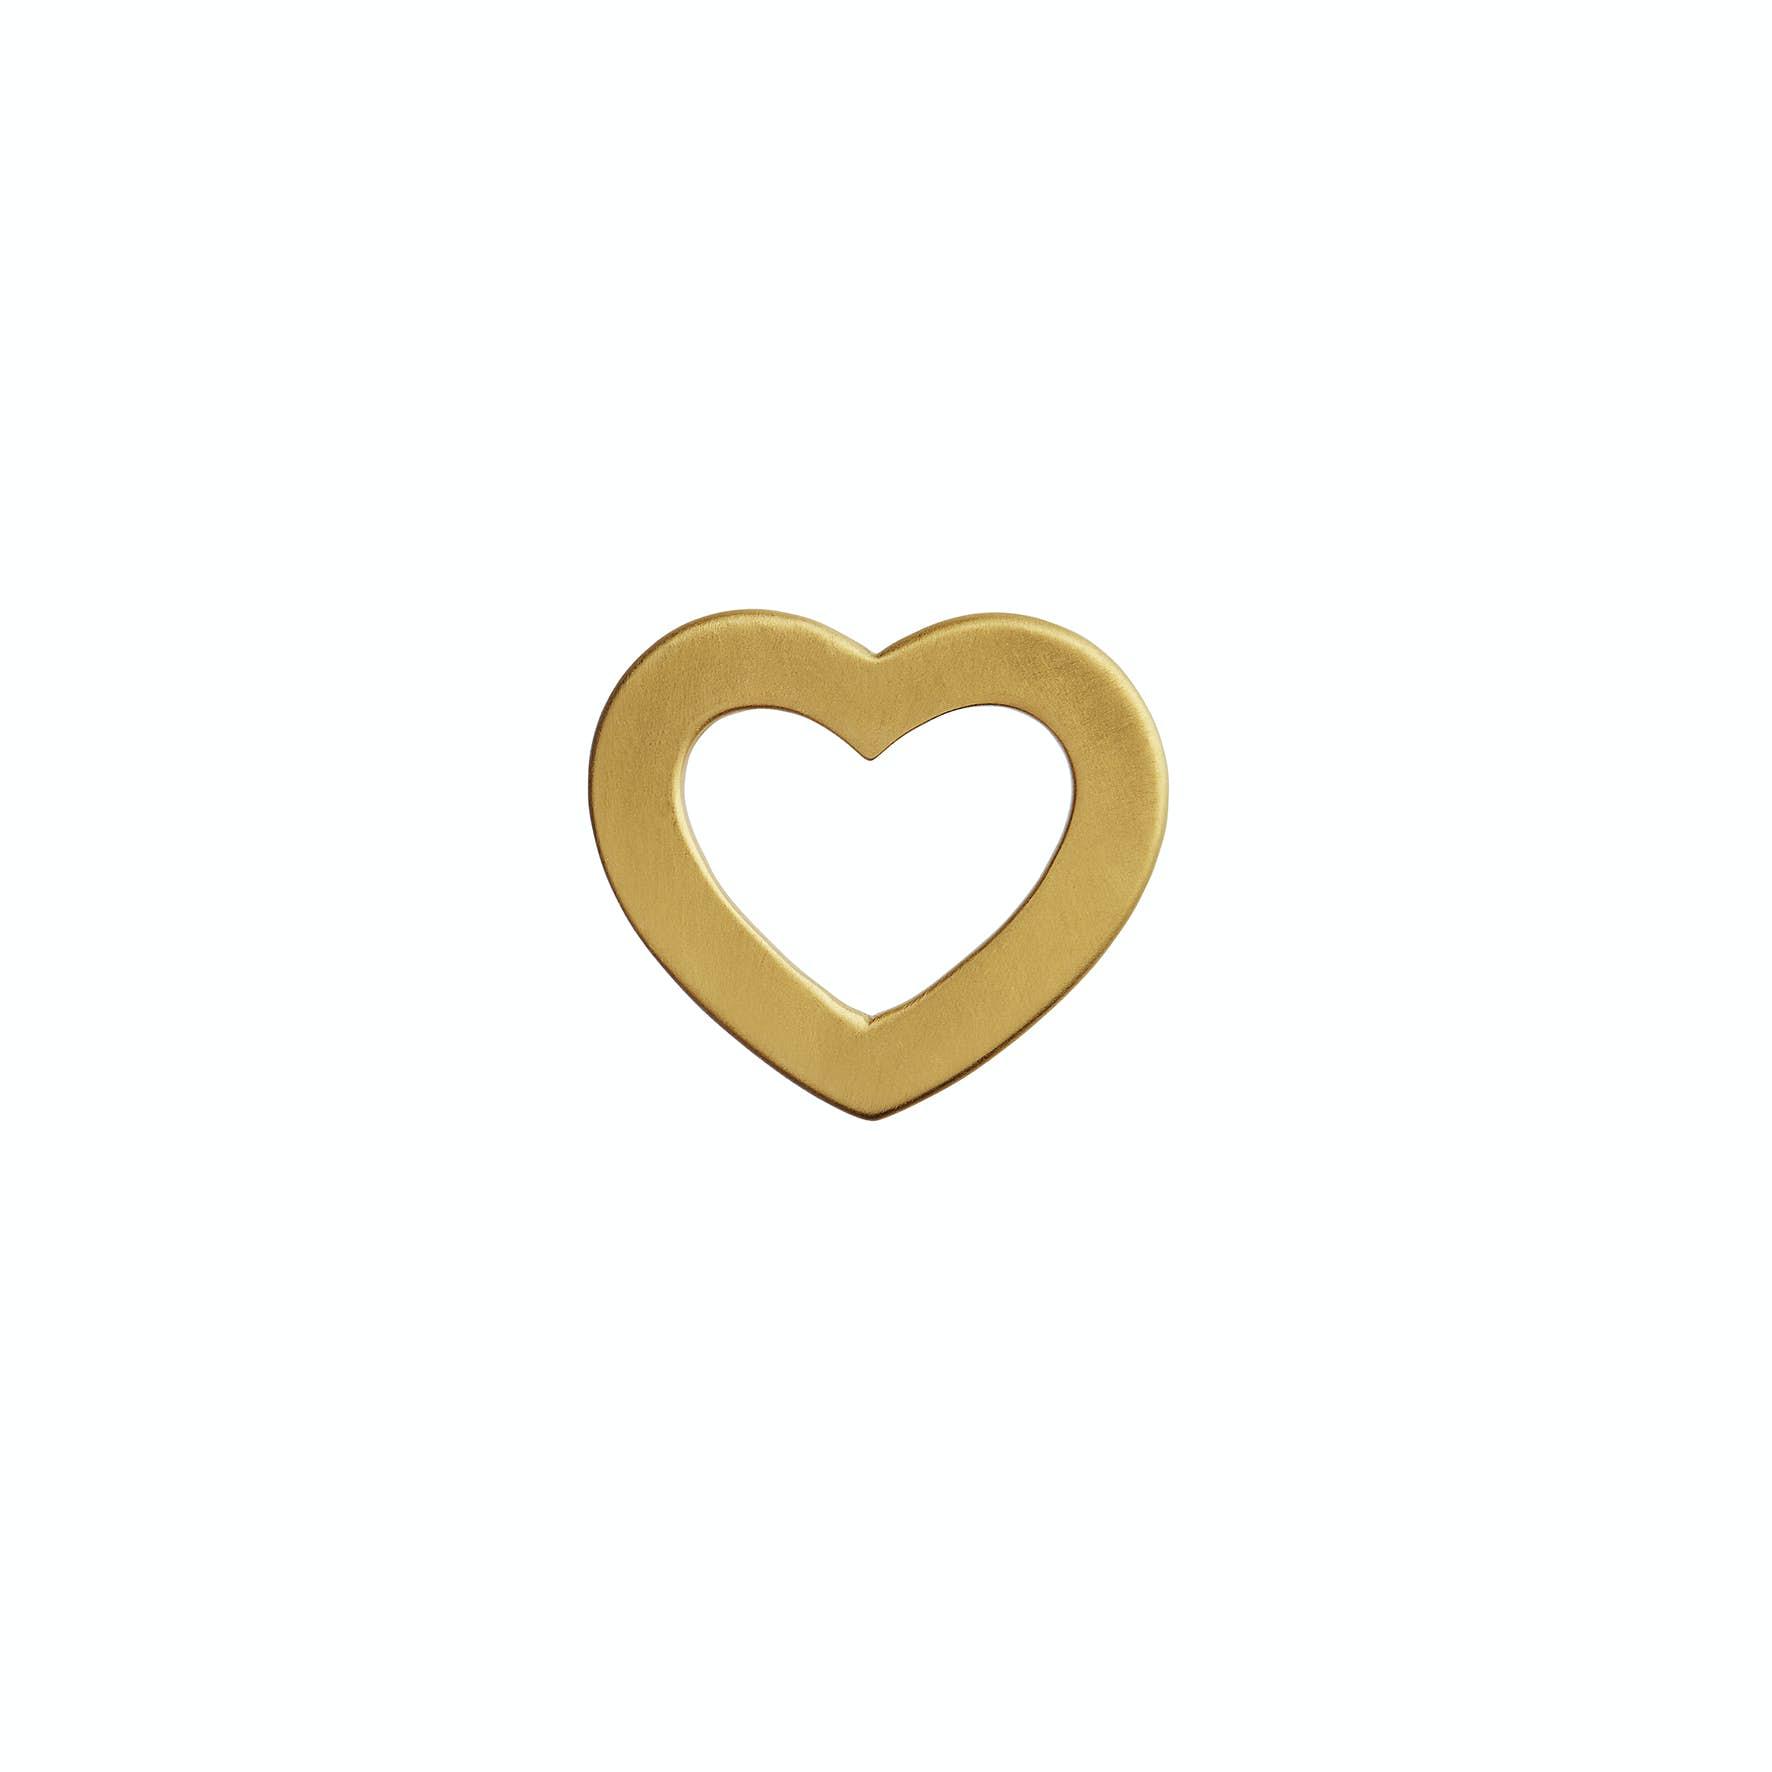 Open Love Heart Pendant von STINE A Jewelry in Vergoldet-Silber Sterling 925